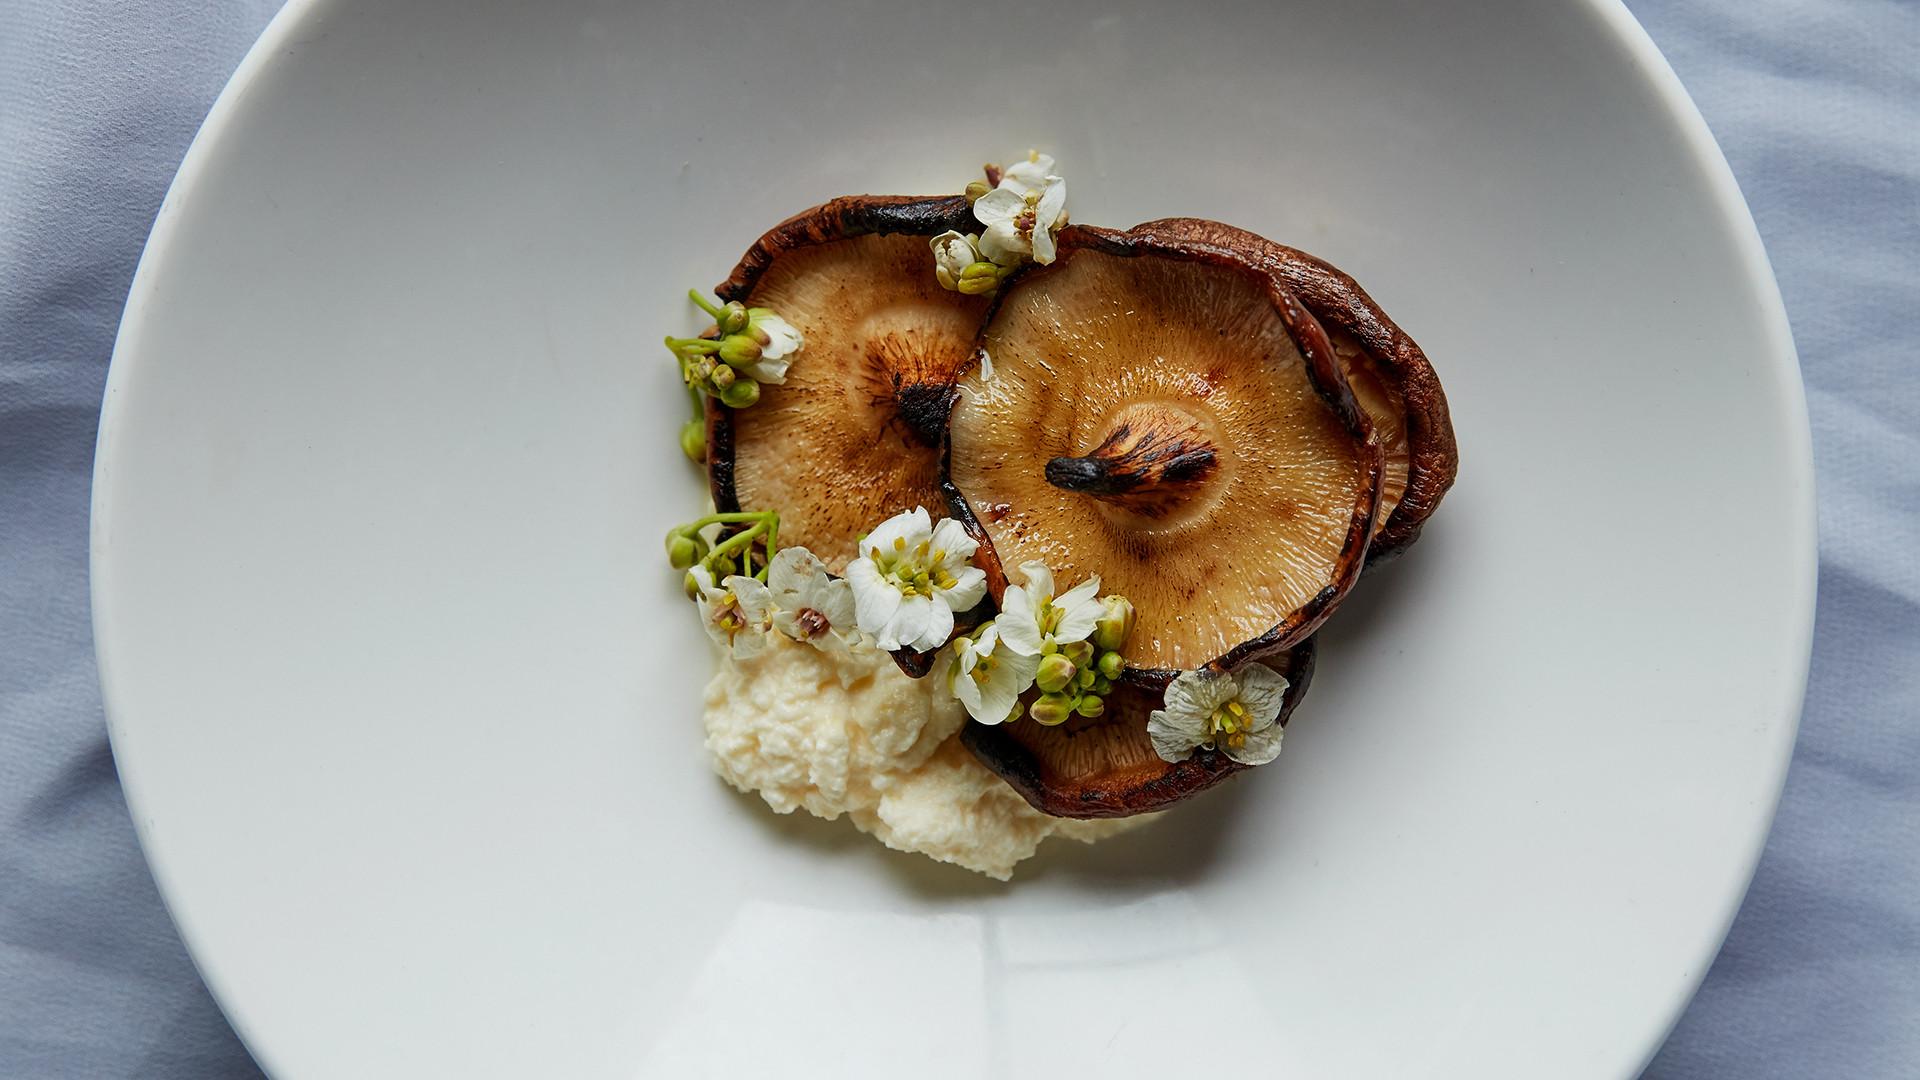 Shiitake mushrooms, ricotta and mushroom garum at Silo